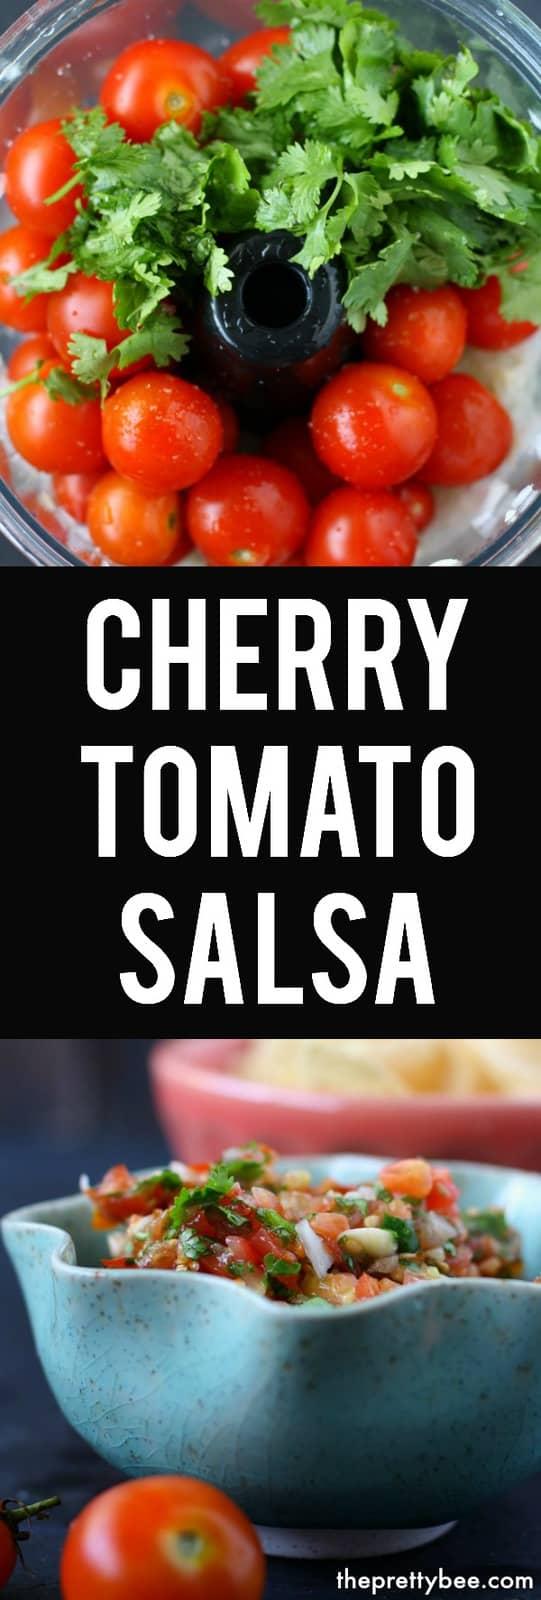 Fullsize Of Cherry Tomato Salsa